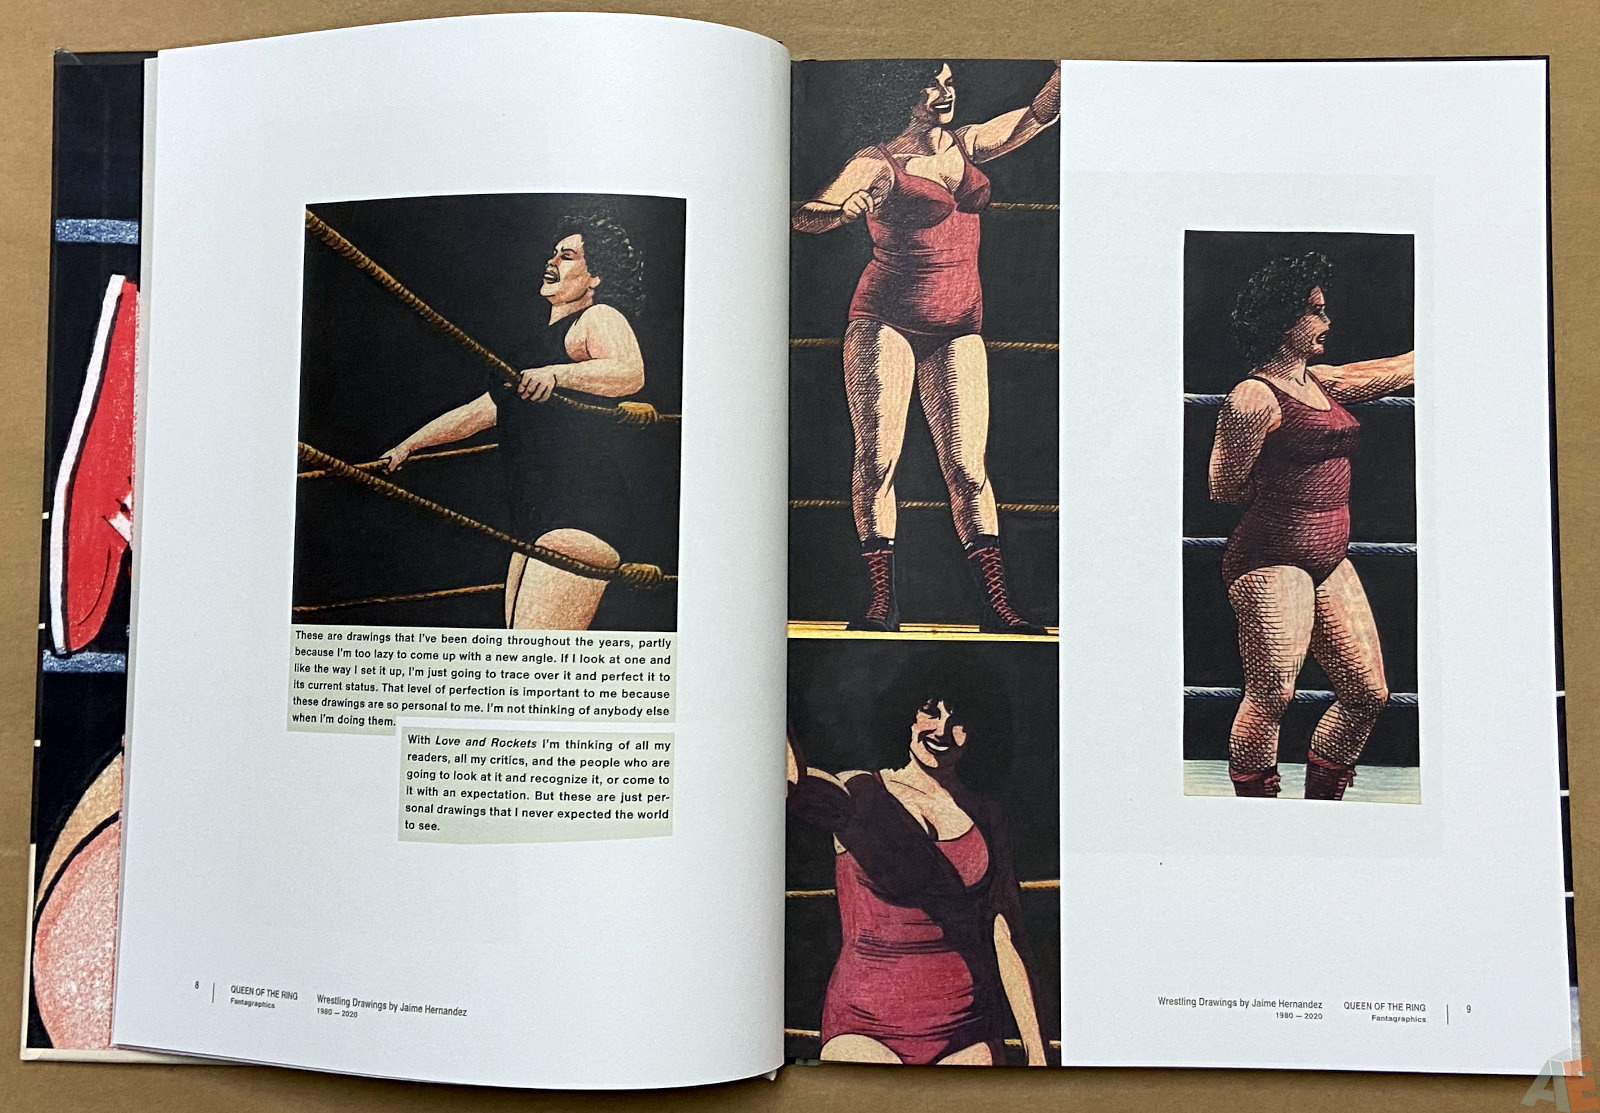 Queen of the Ring Wrestling Drawings by Jaime Hernandez 1980 2020 interior 2